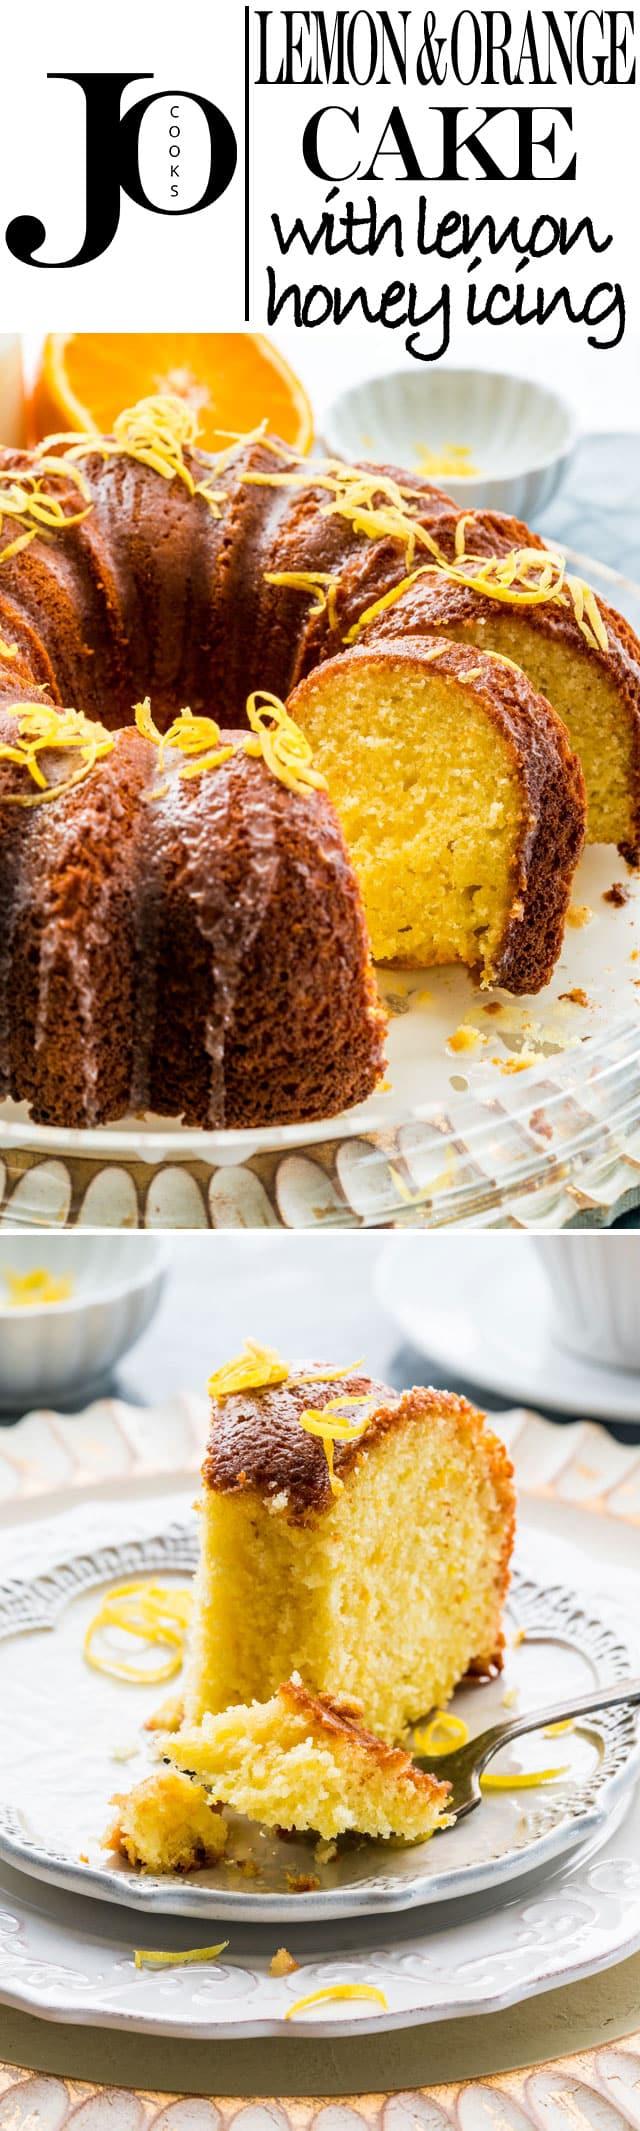 Lemon Orange Cake With Lemon Honey Glaze Jo Cooks